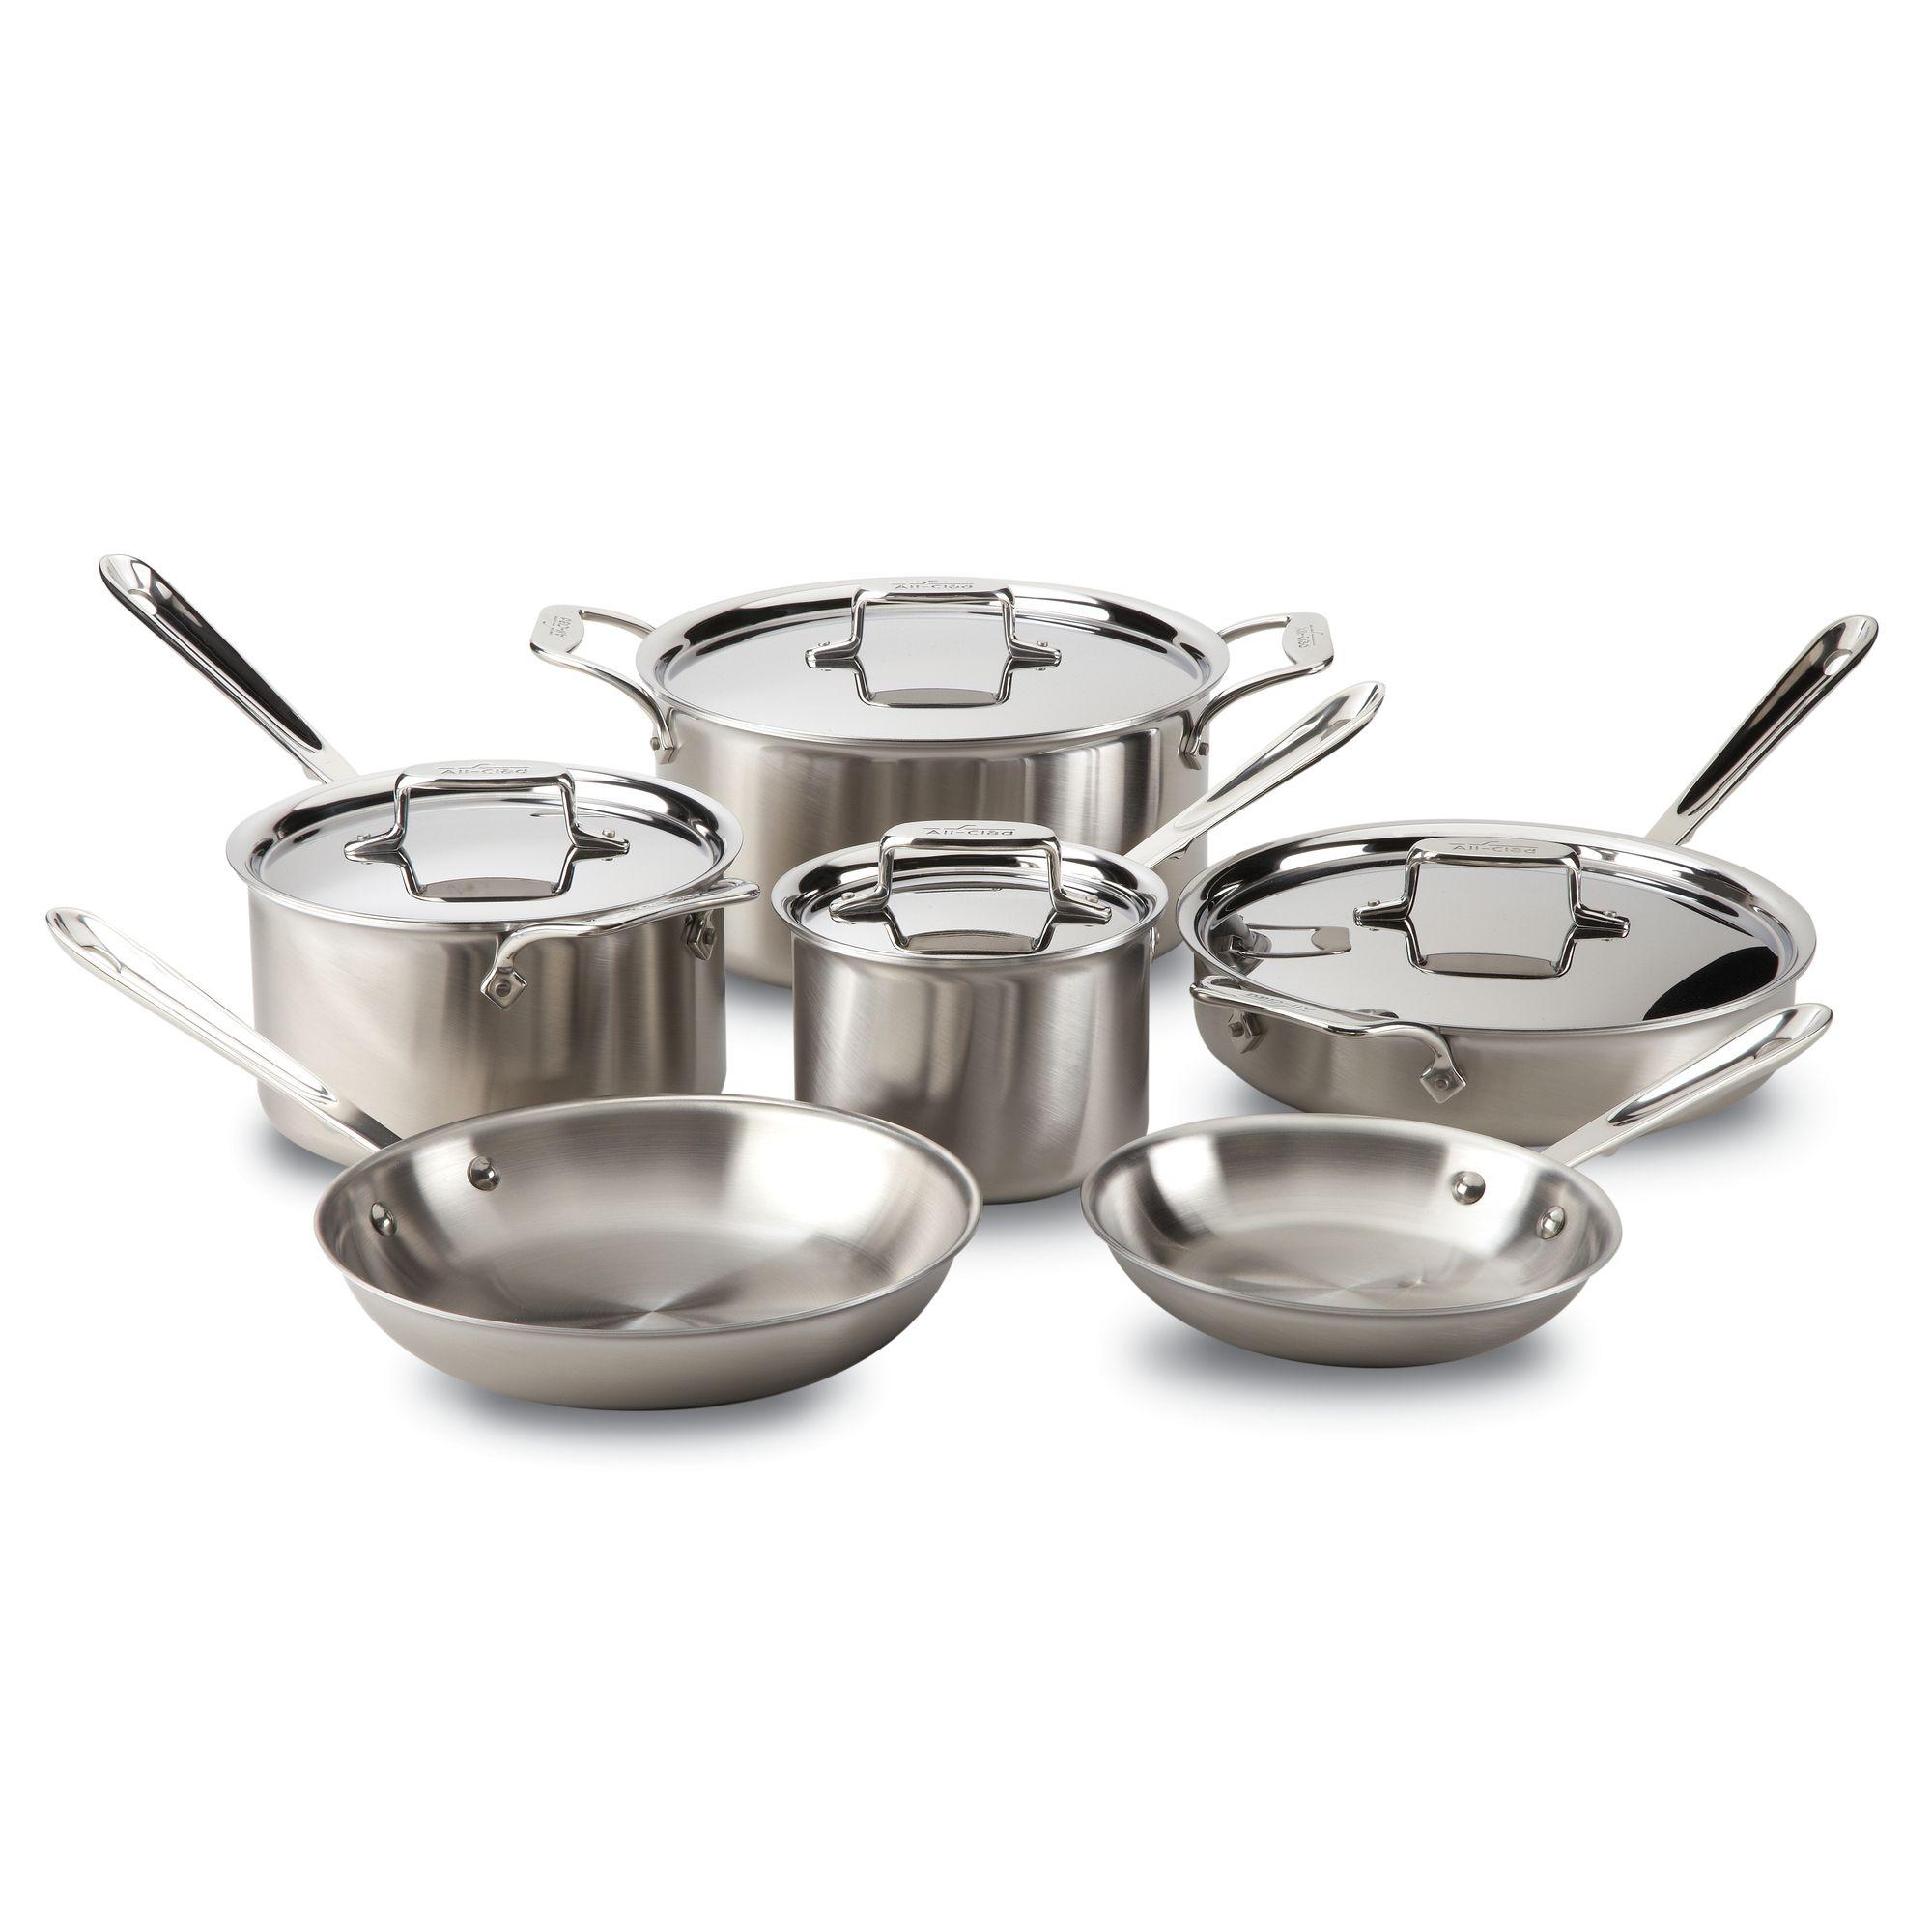 Application Error Dishwasher Safe Cookware Safest Cookware Cookware Set Stainless Steel